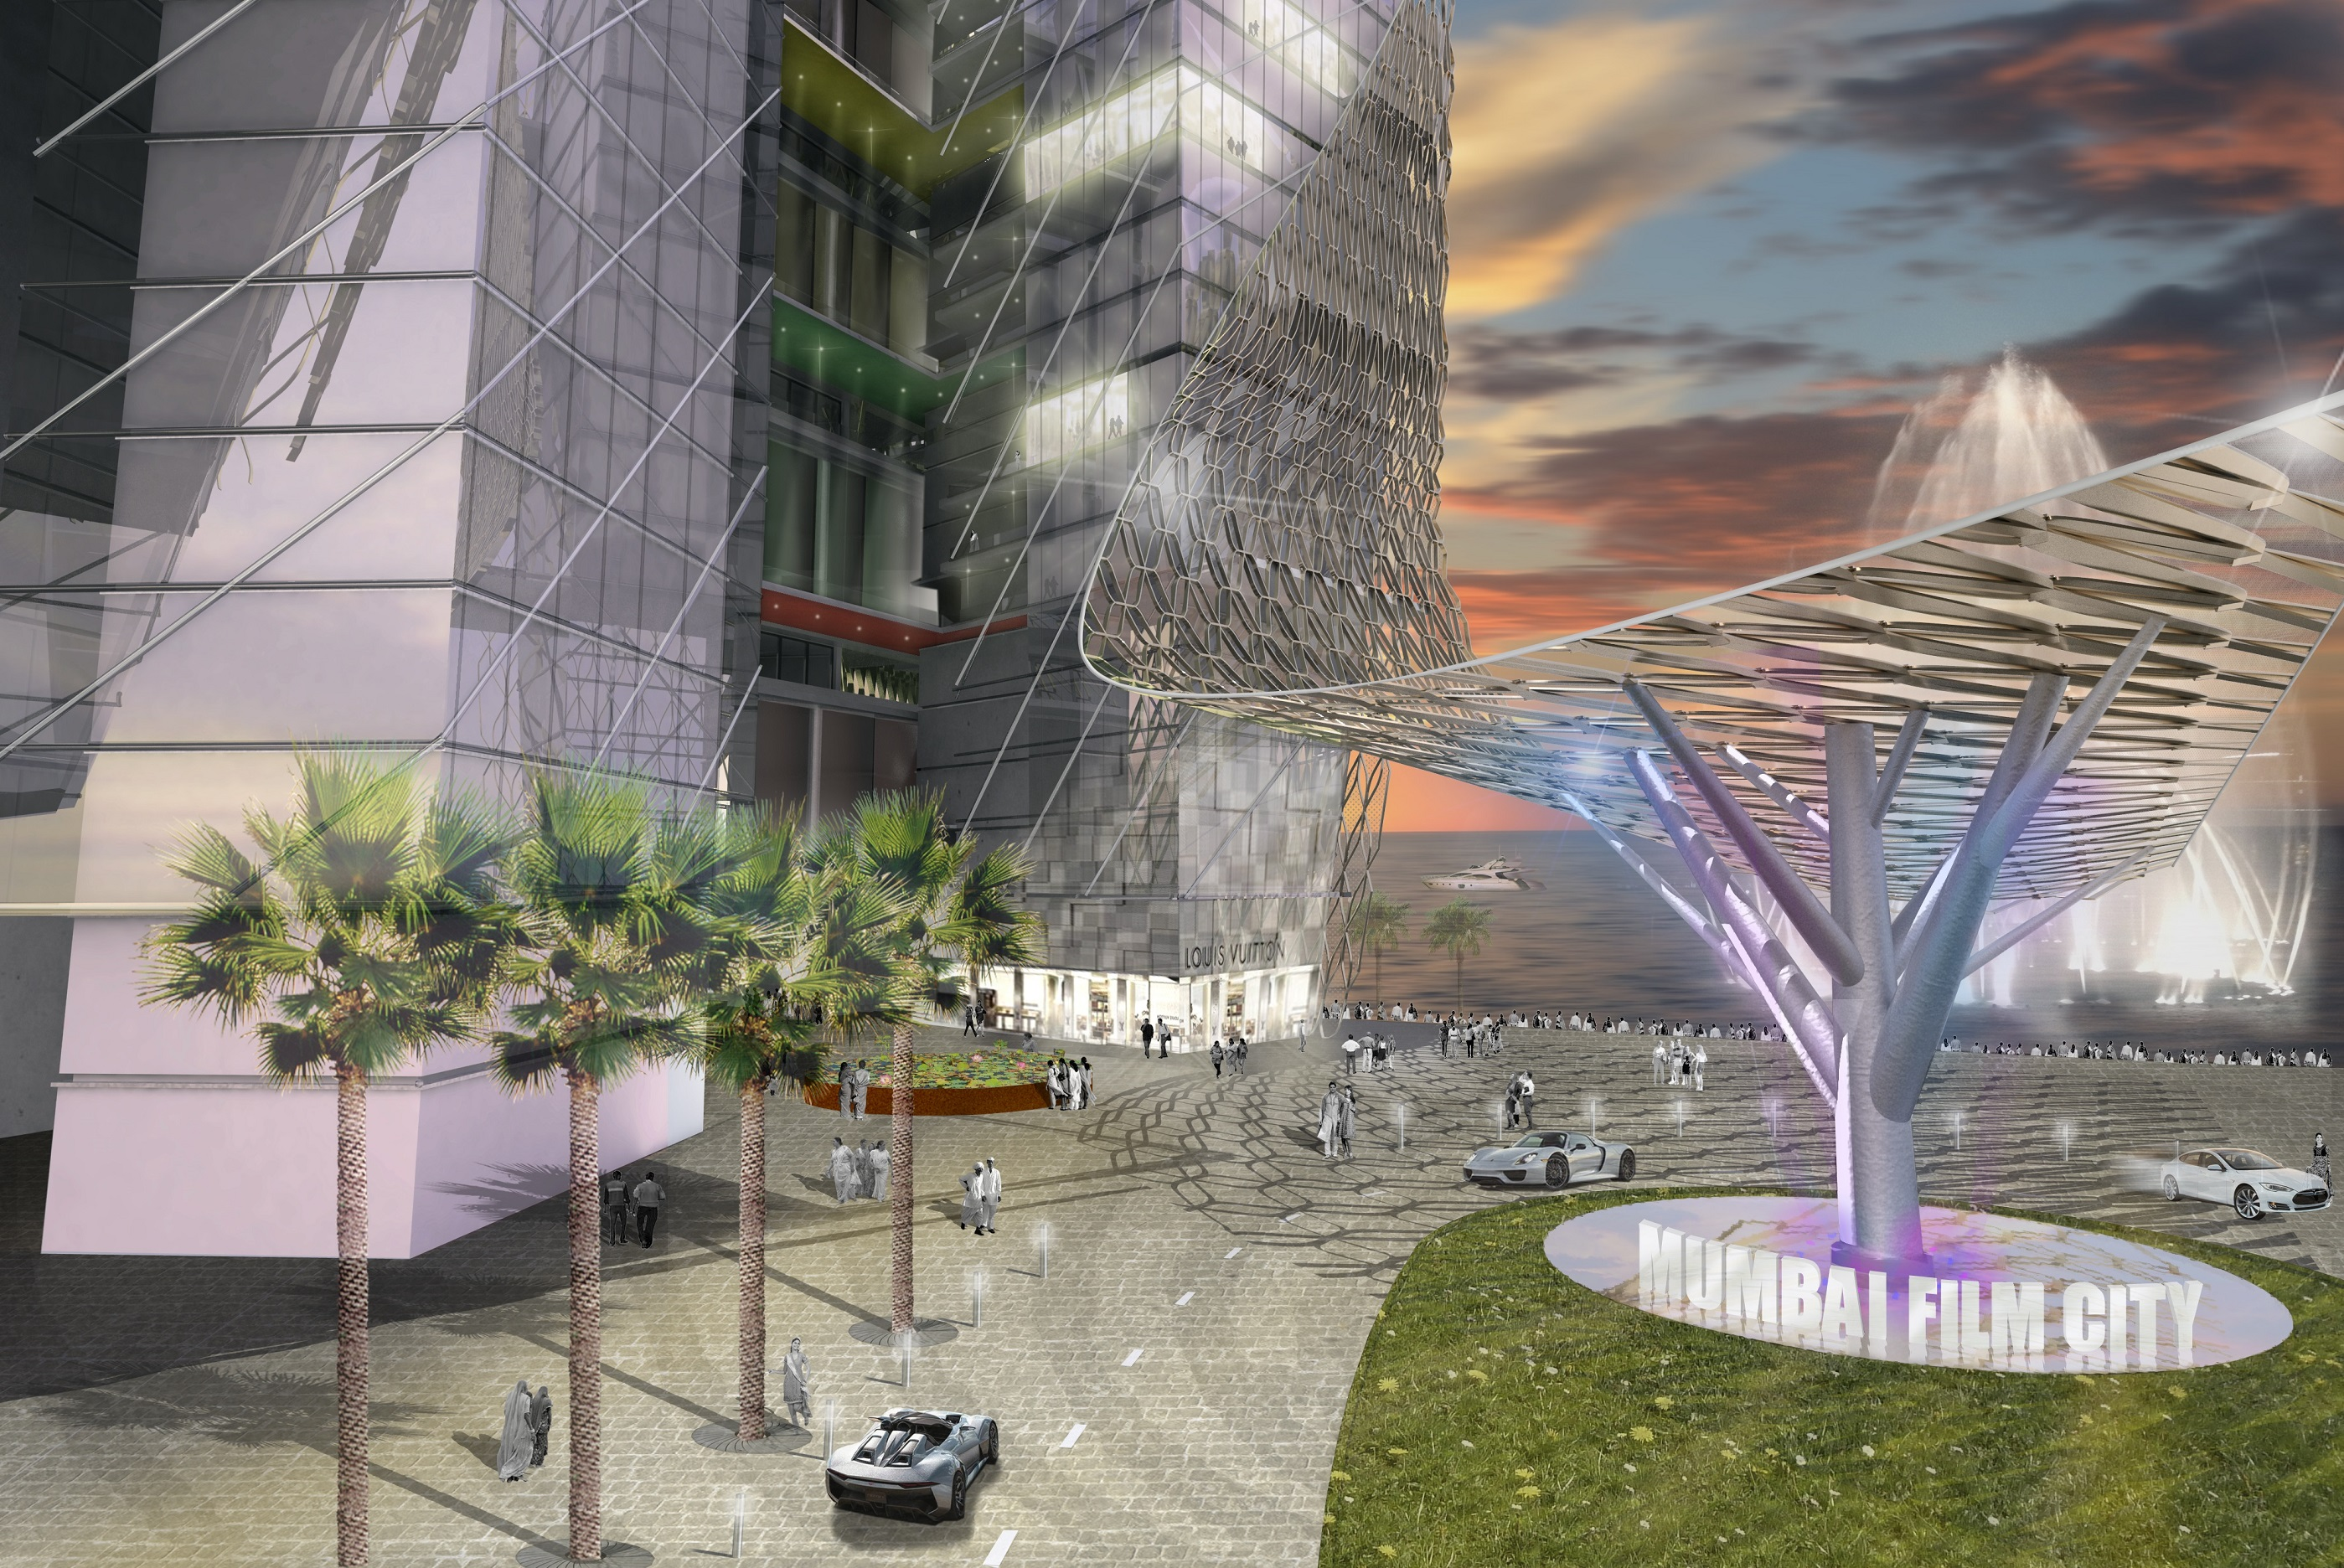 Vertical Film City - TENarchitects